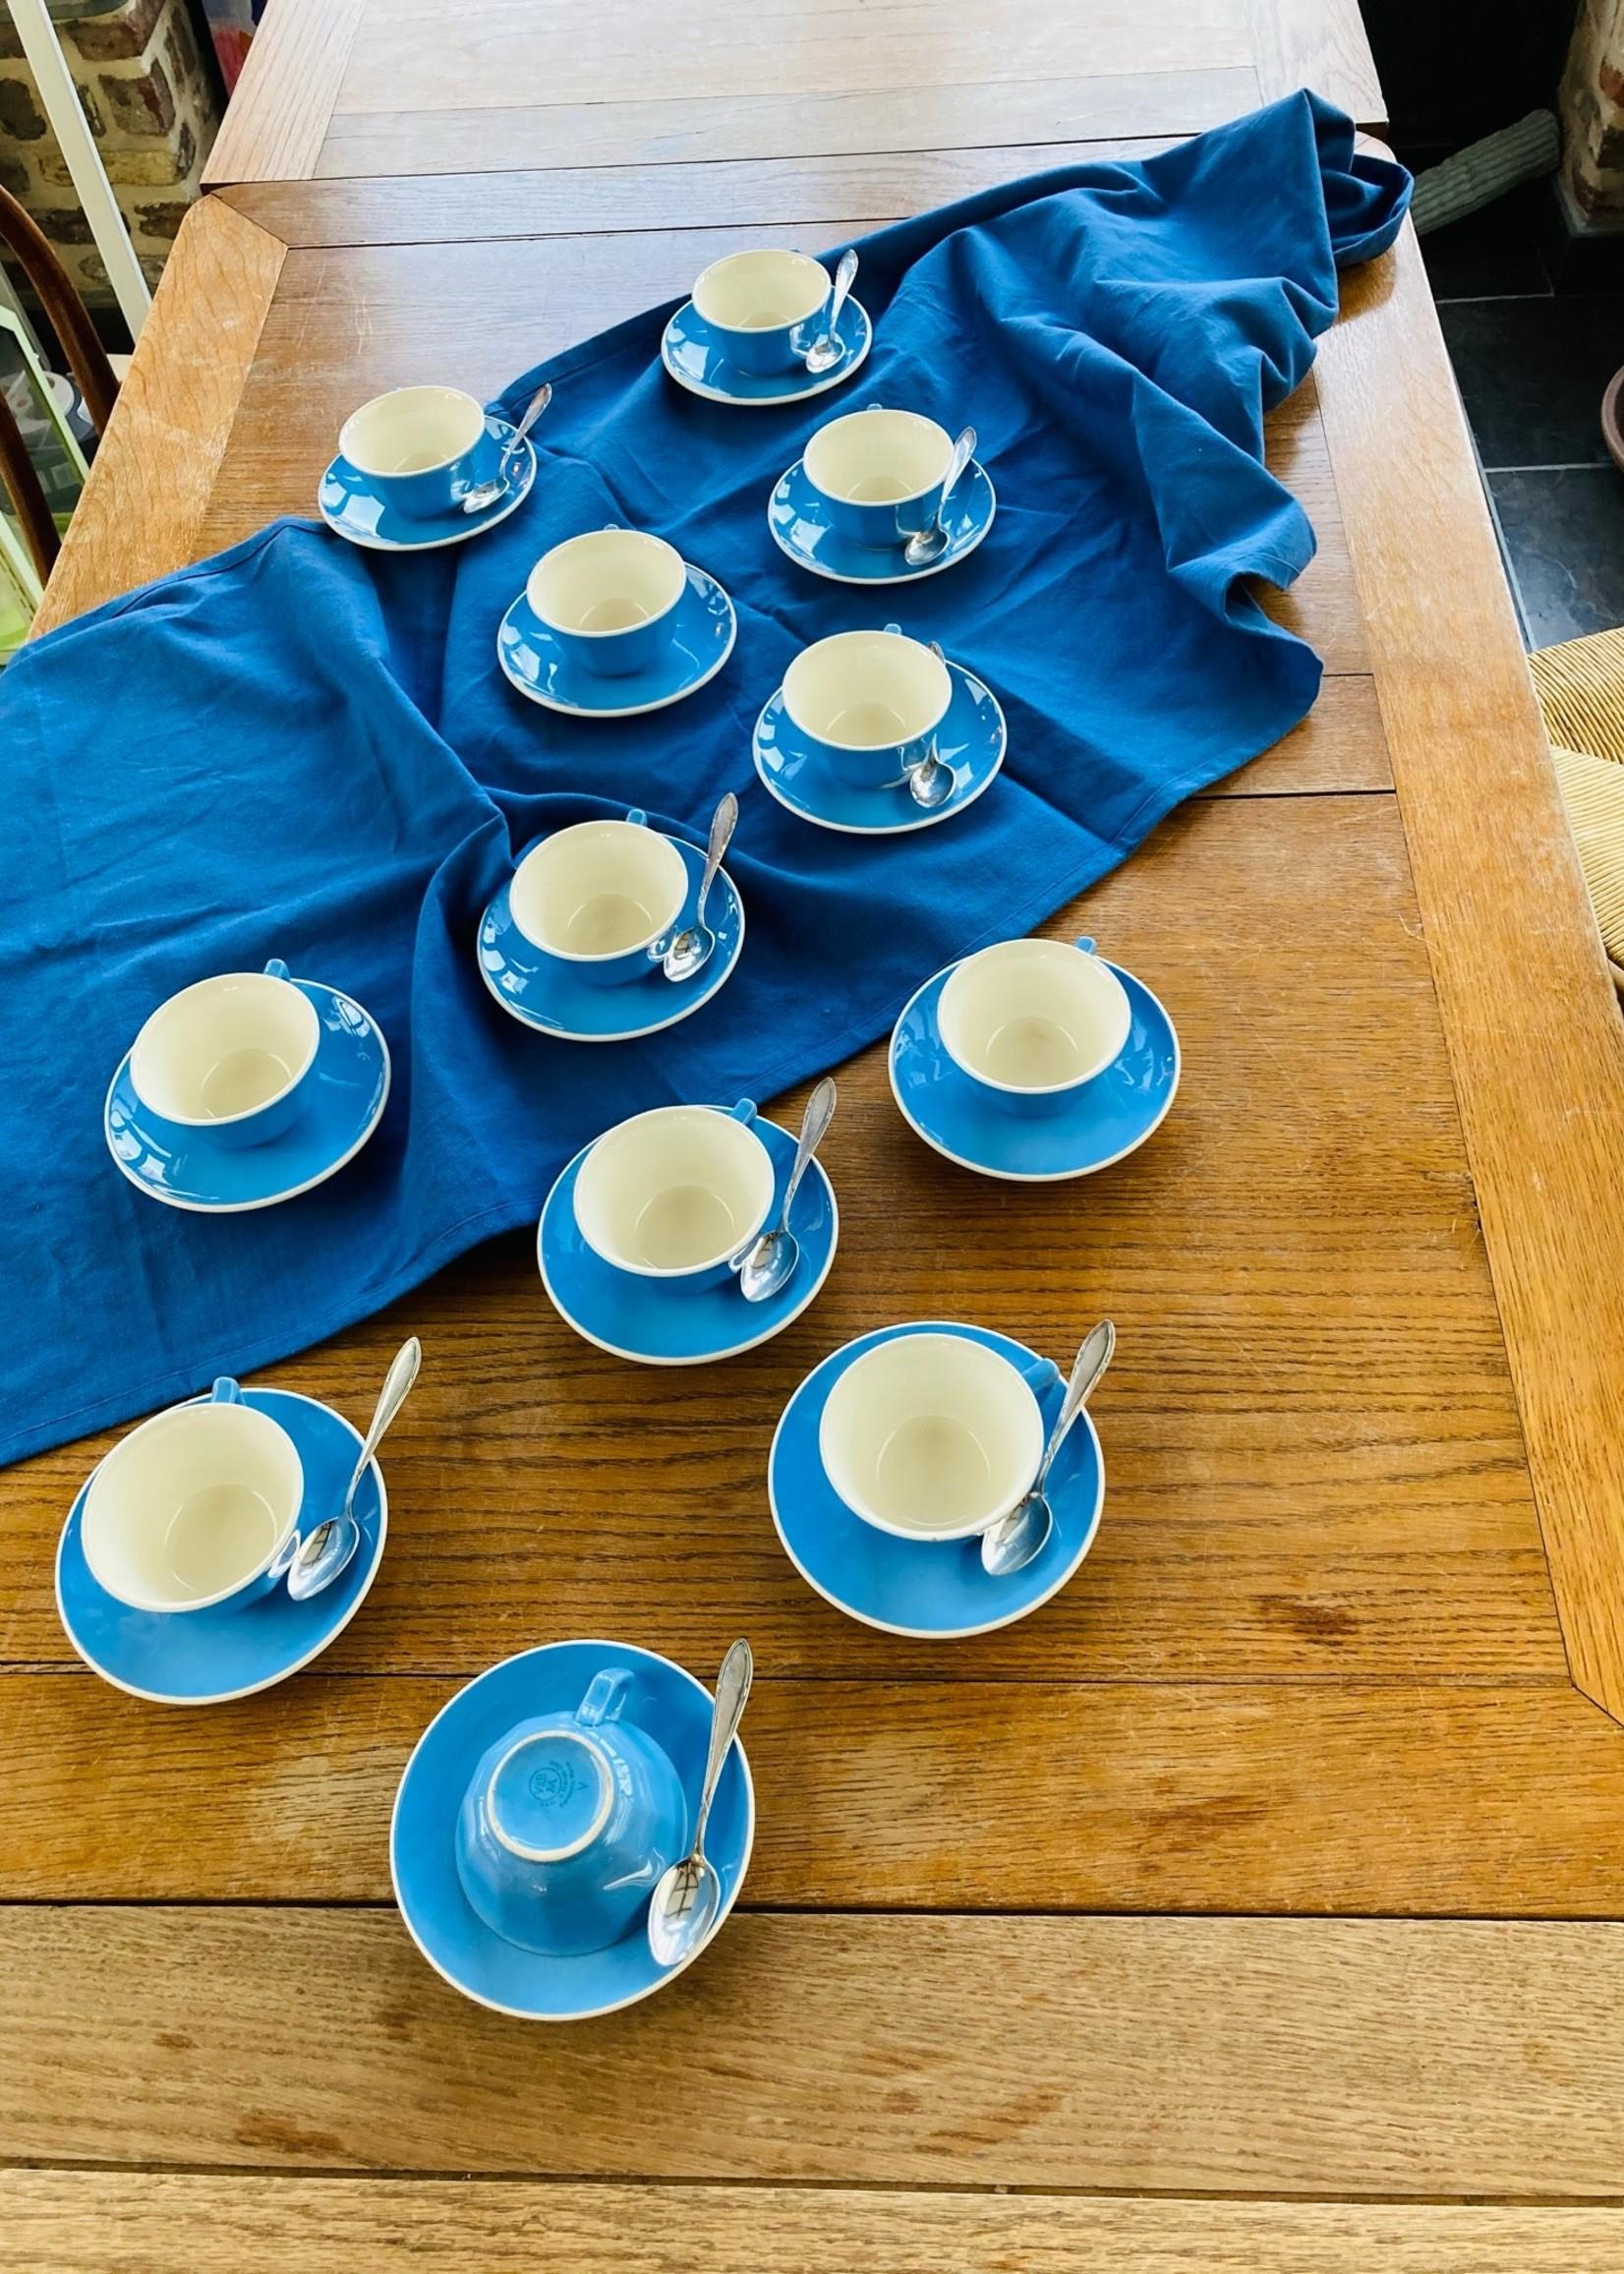 Coffee service Blue Deco Orléans Villeroy & Boch France